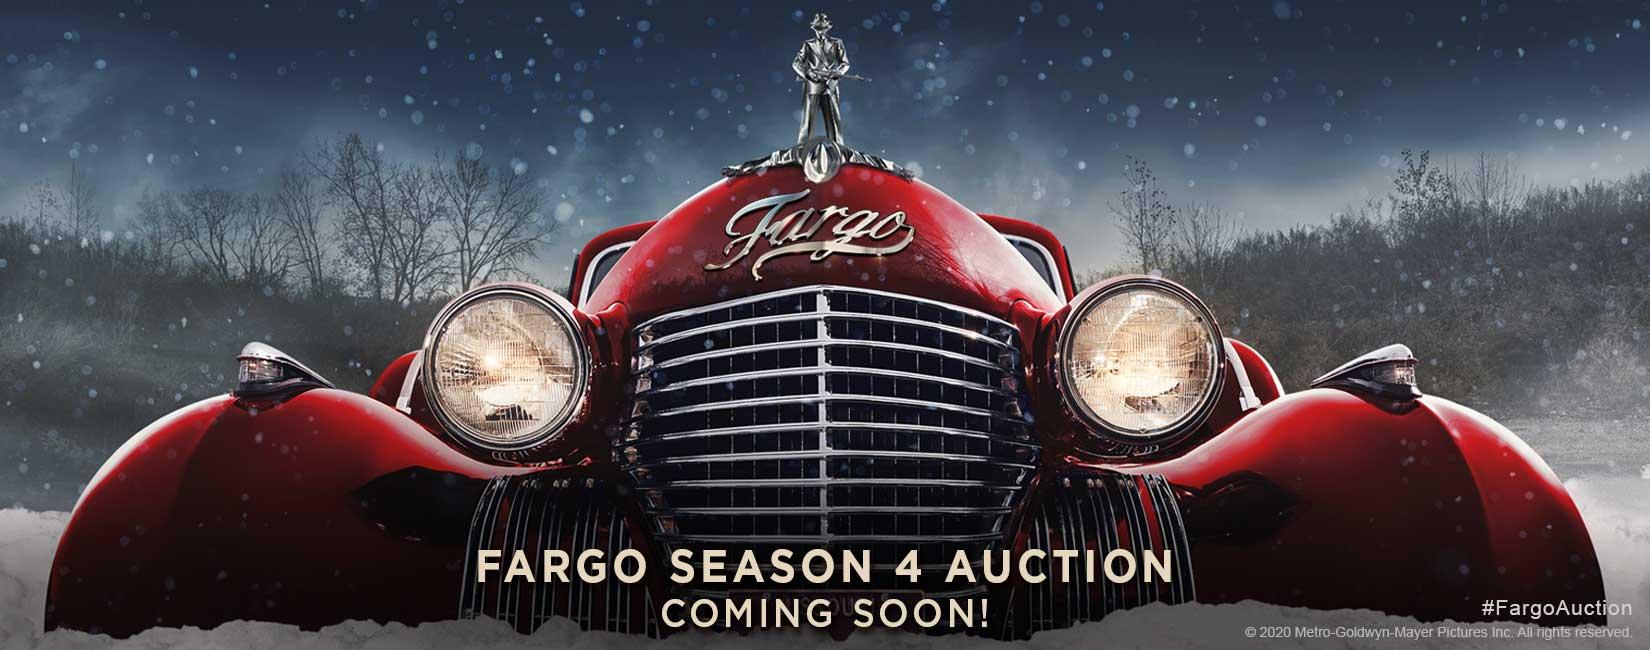 Fargo Season 4 Auction